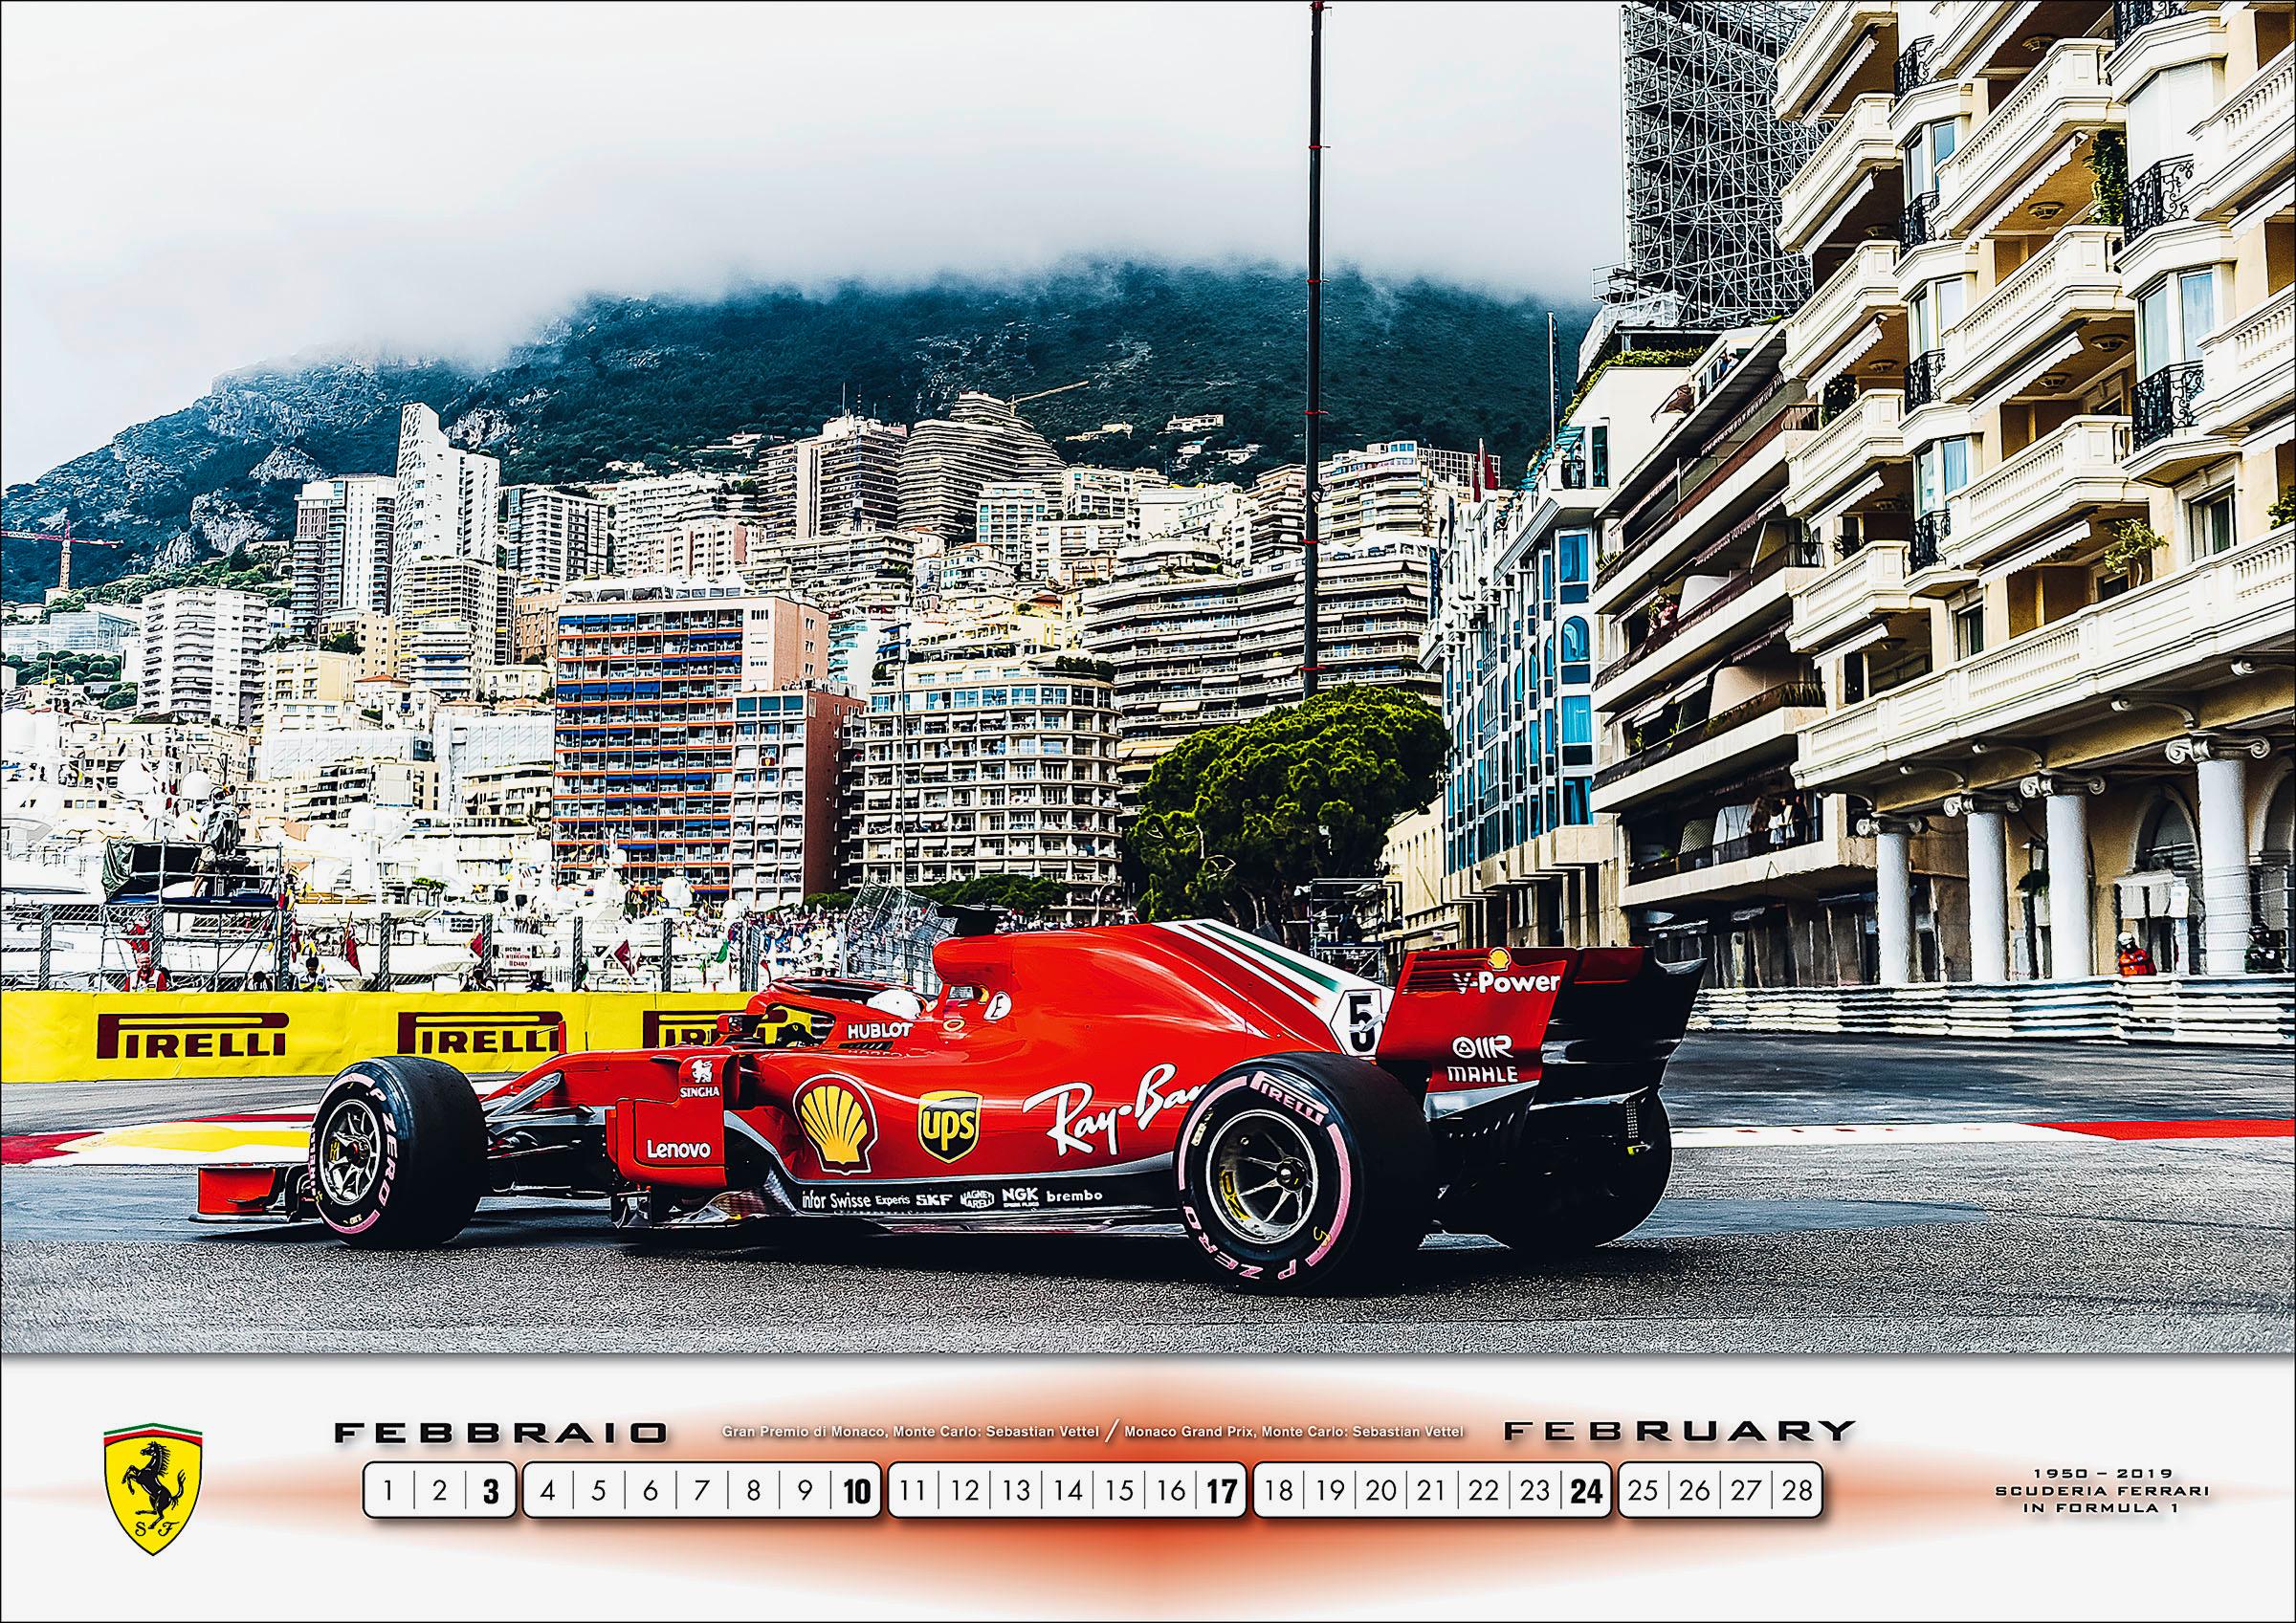 Ferrari, 2019 Ferrari calendar includes sounds and smells, ClassicCars.com Journal